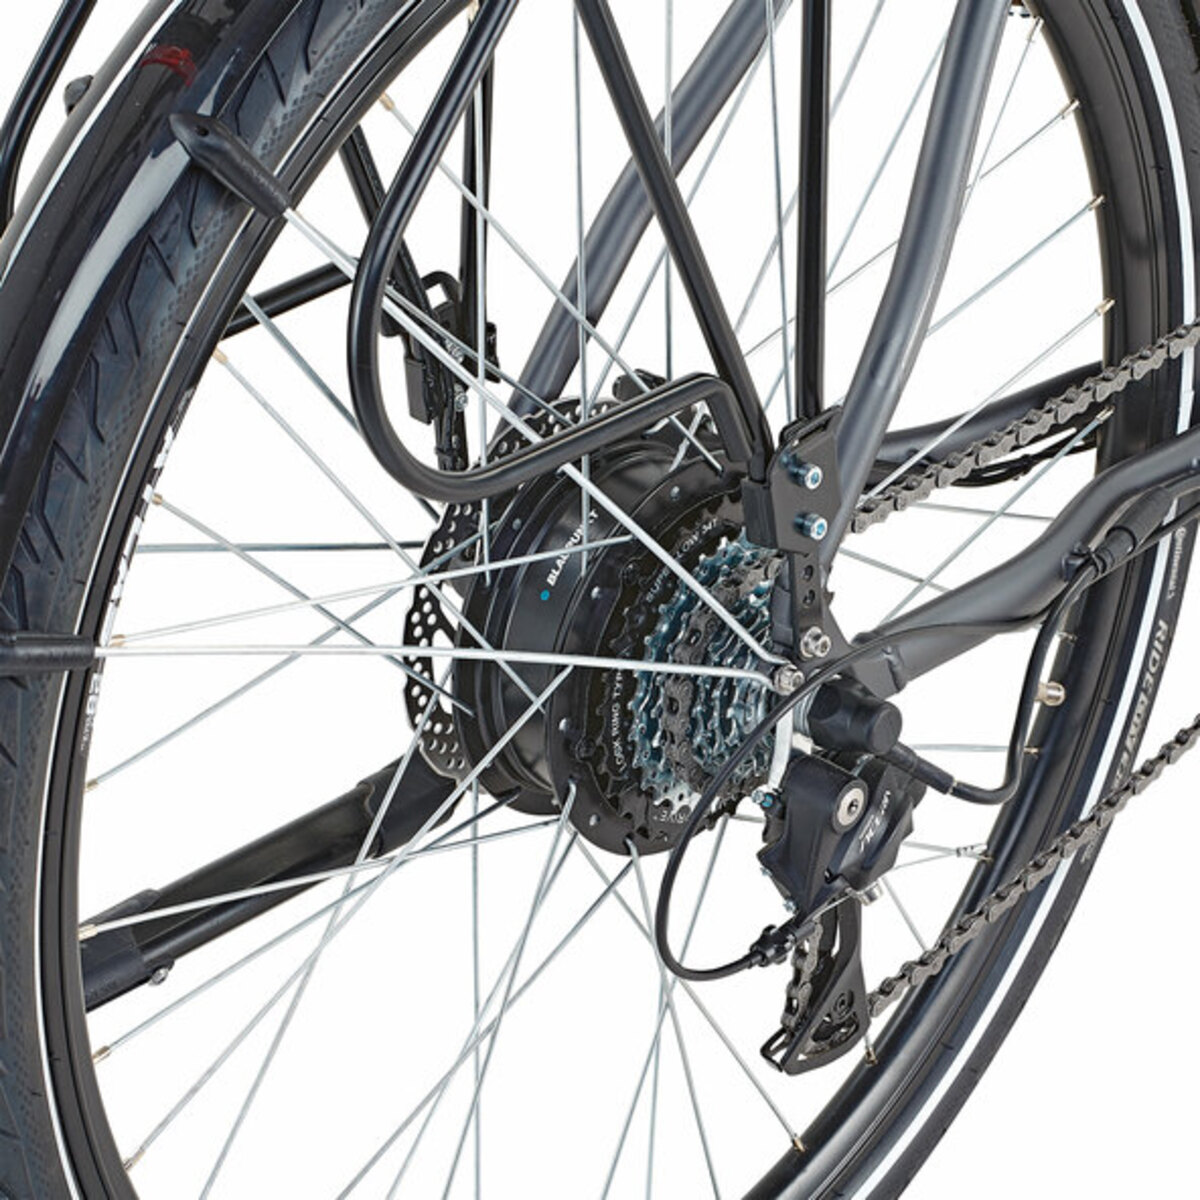 Bild 5 von Alu-Trekking-E-Bike 28″